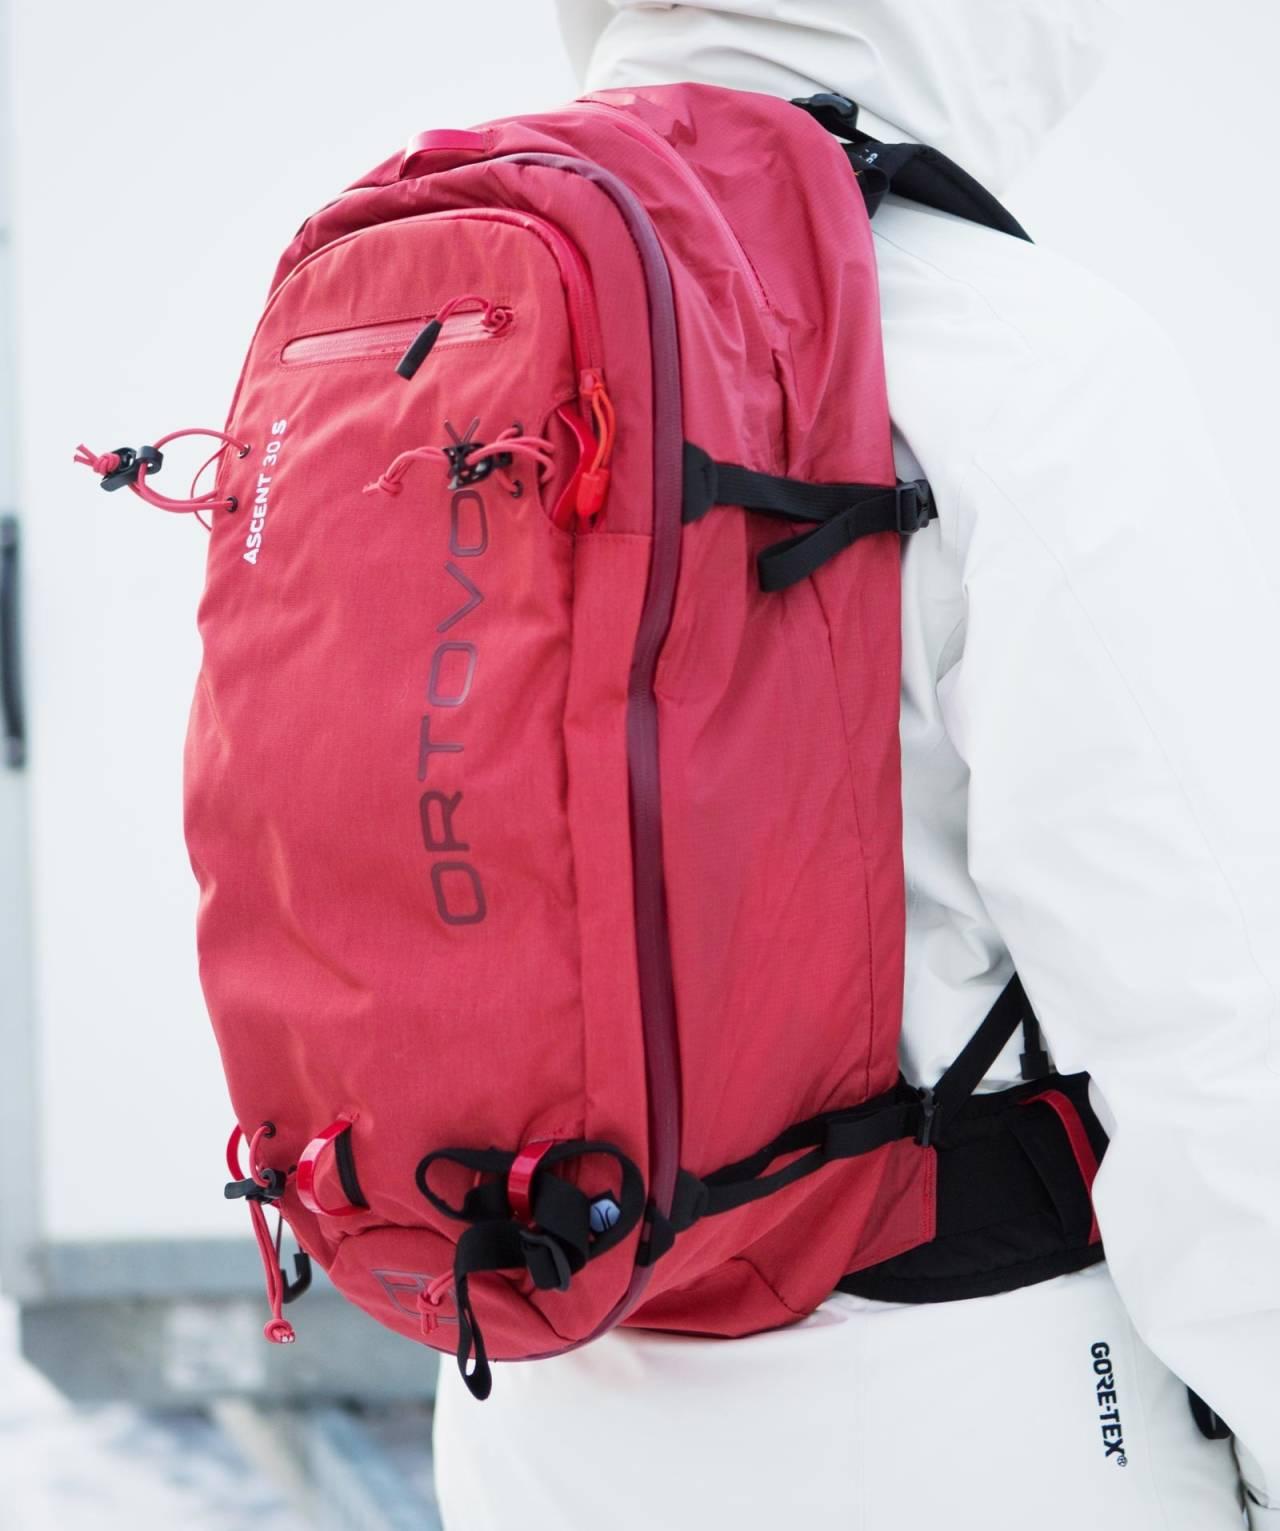 Ortovox Ascent 30s